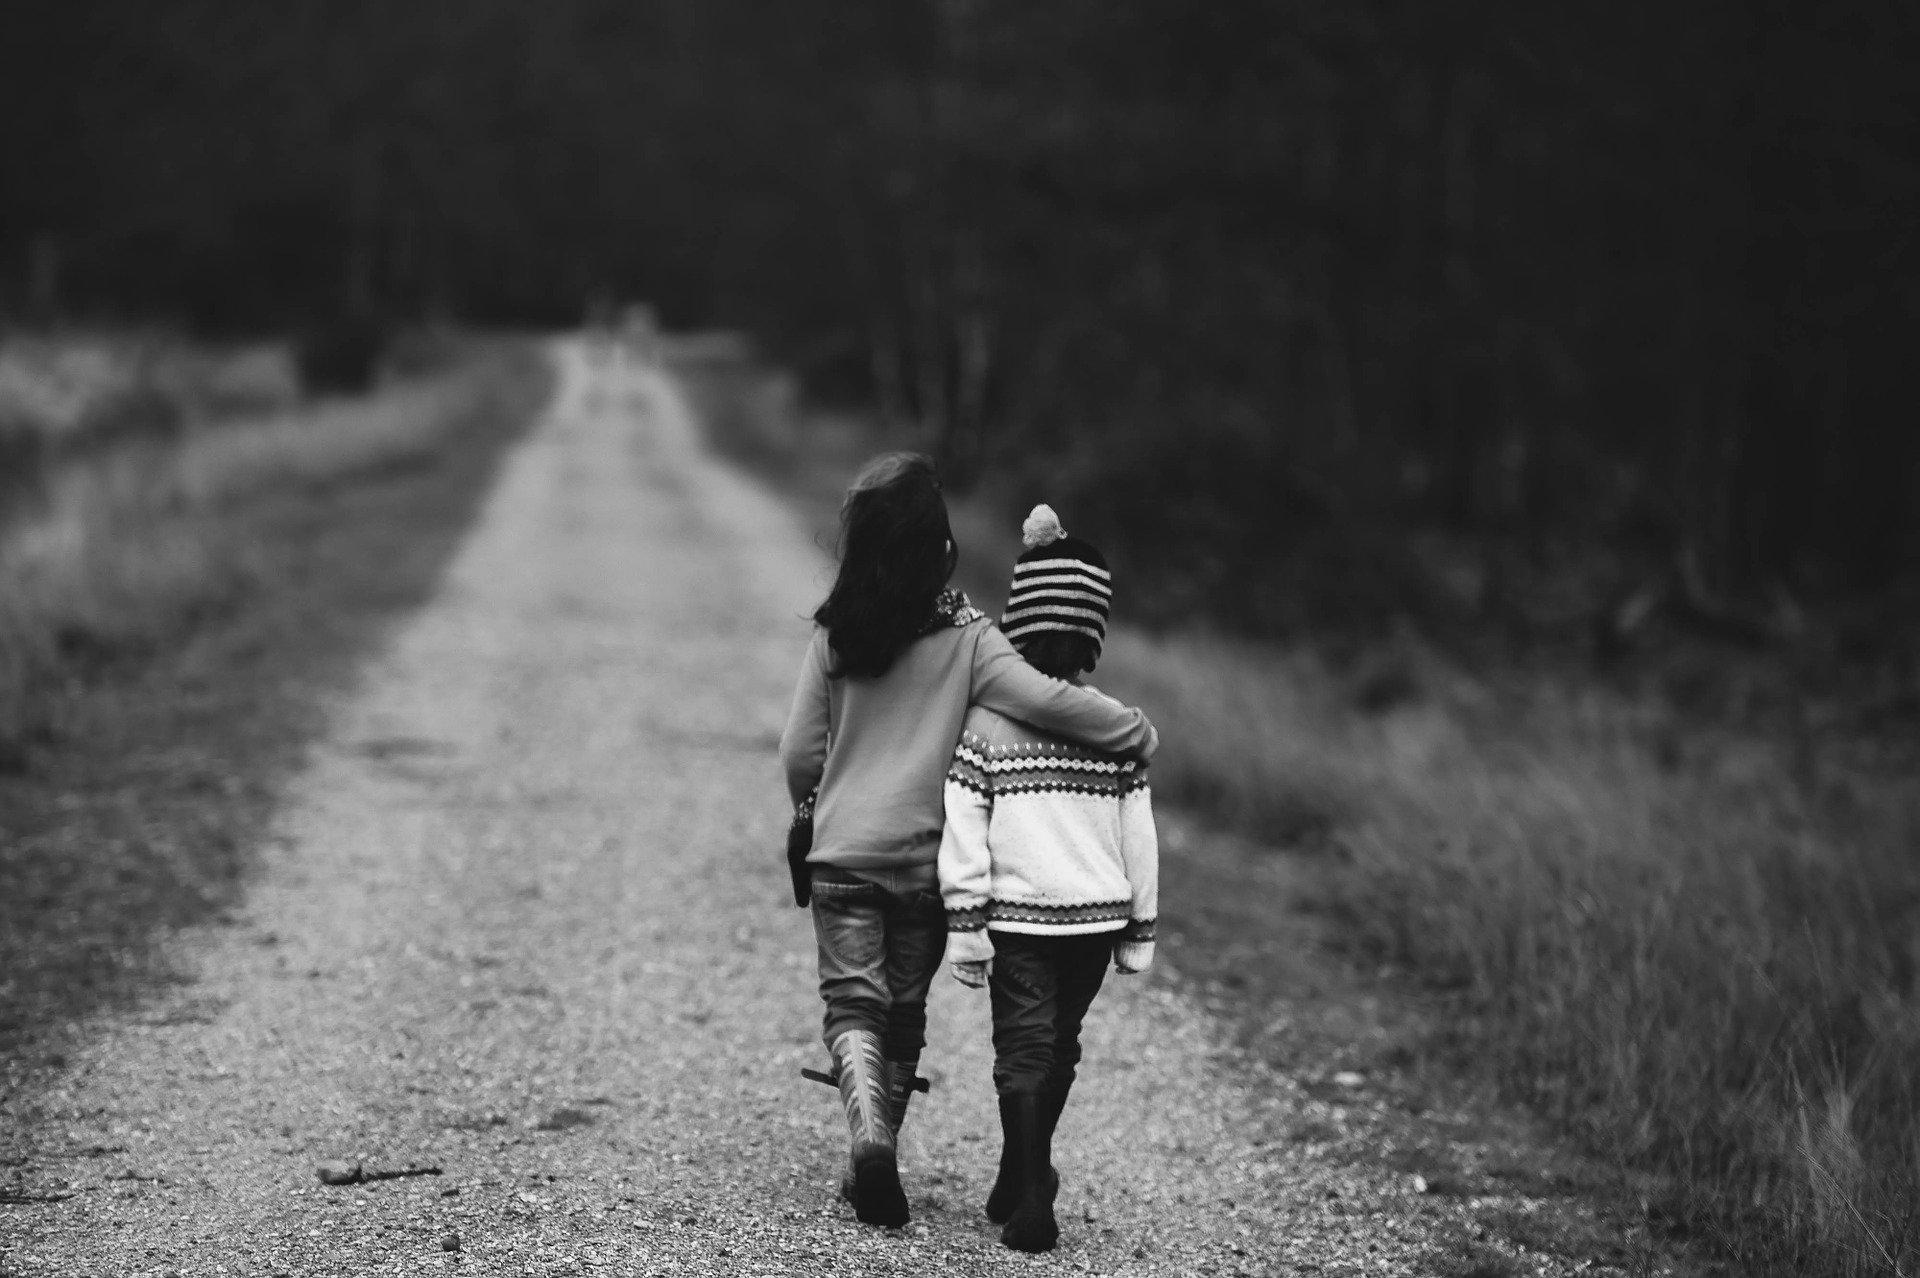 Äldre syskons studieval styr